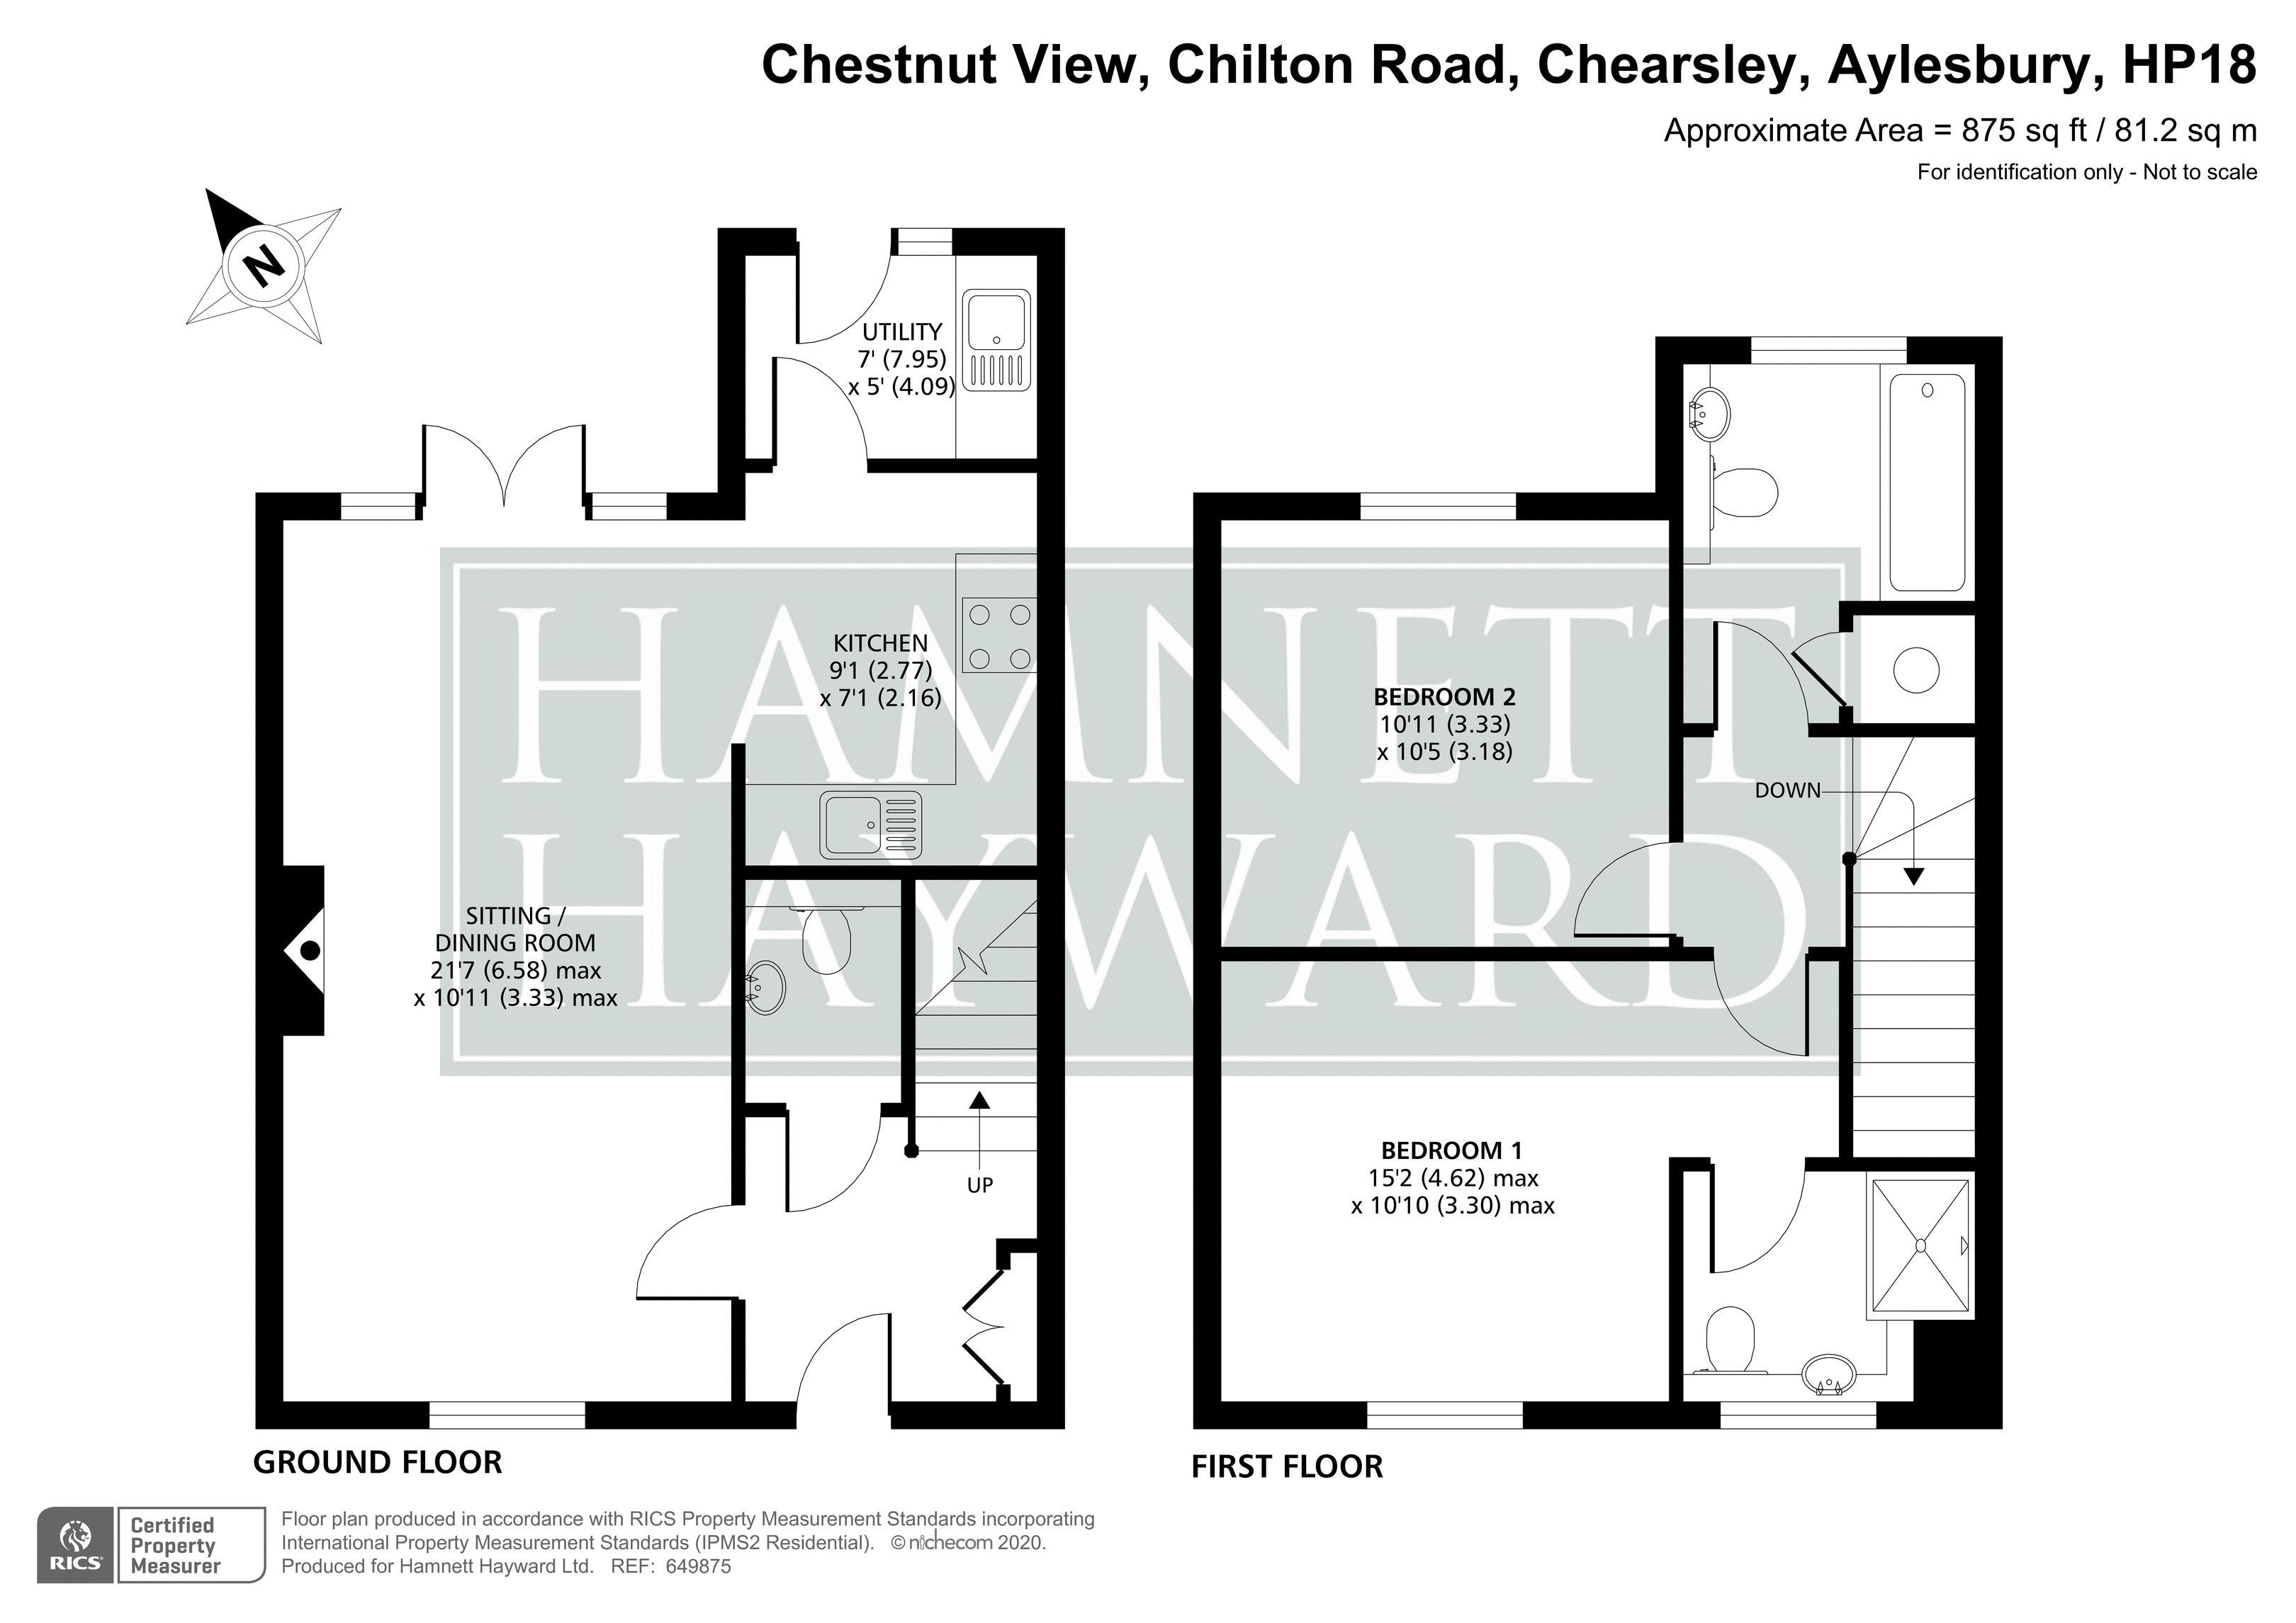 Chilton Road Chearsley